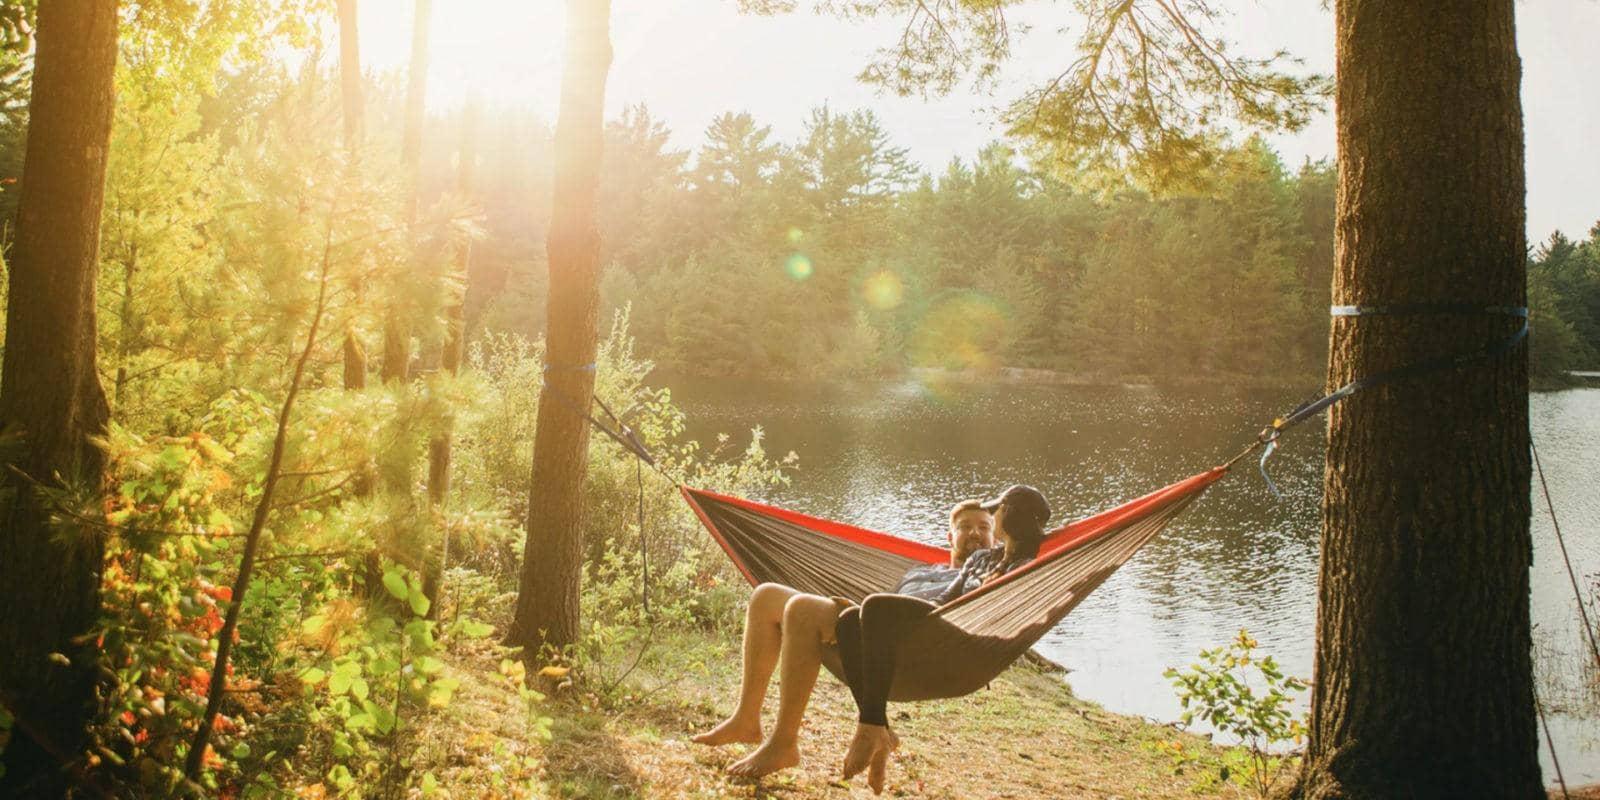 location emplacements camping activital étang de baye